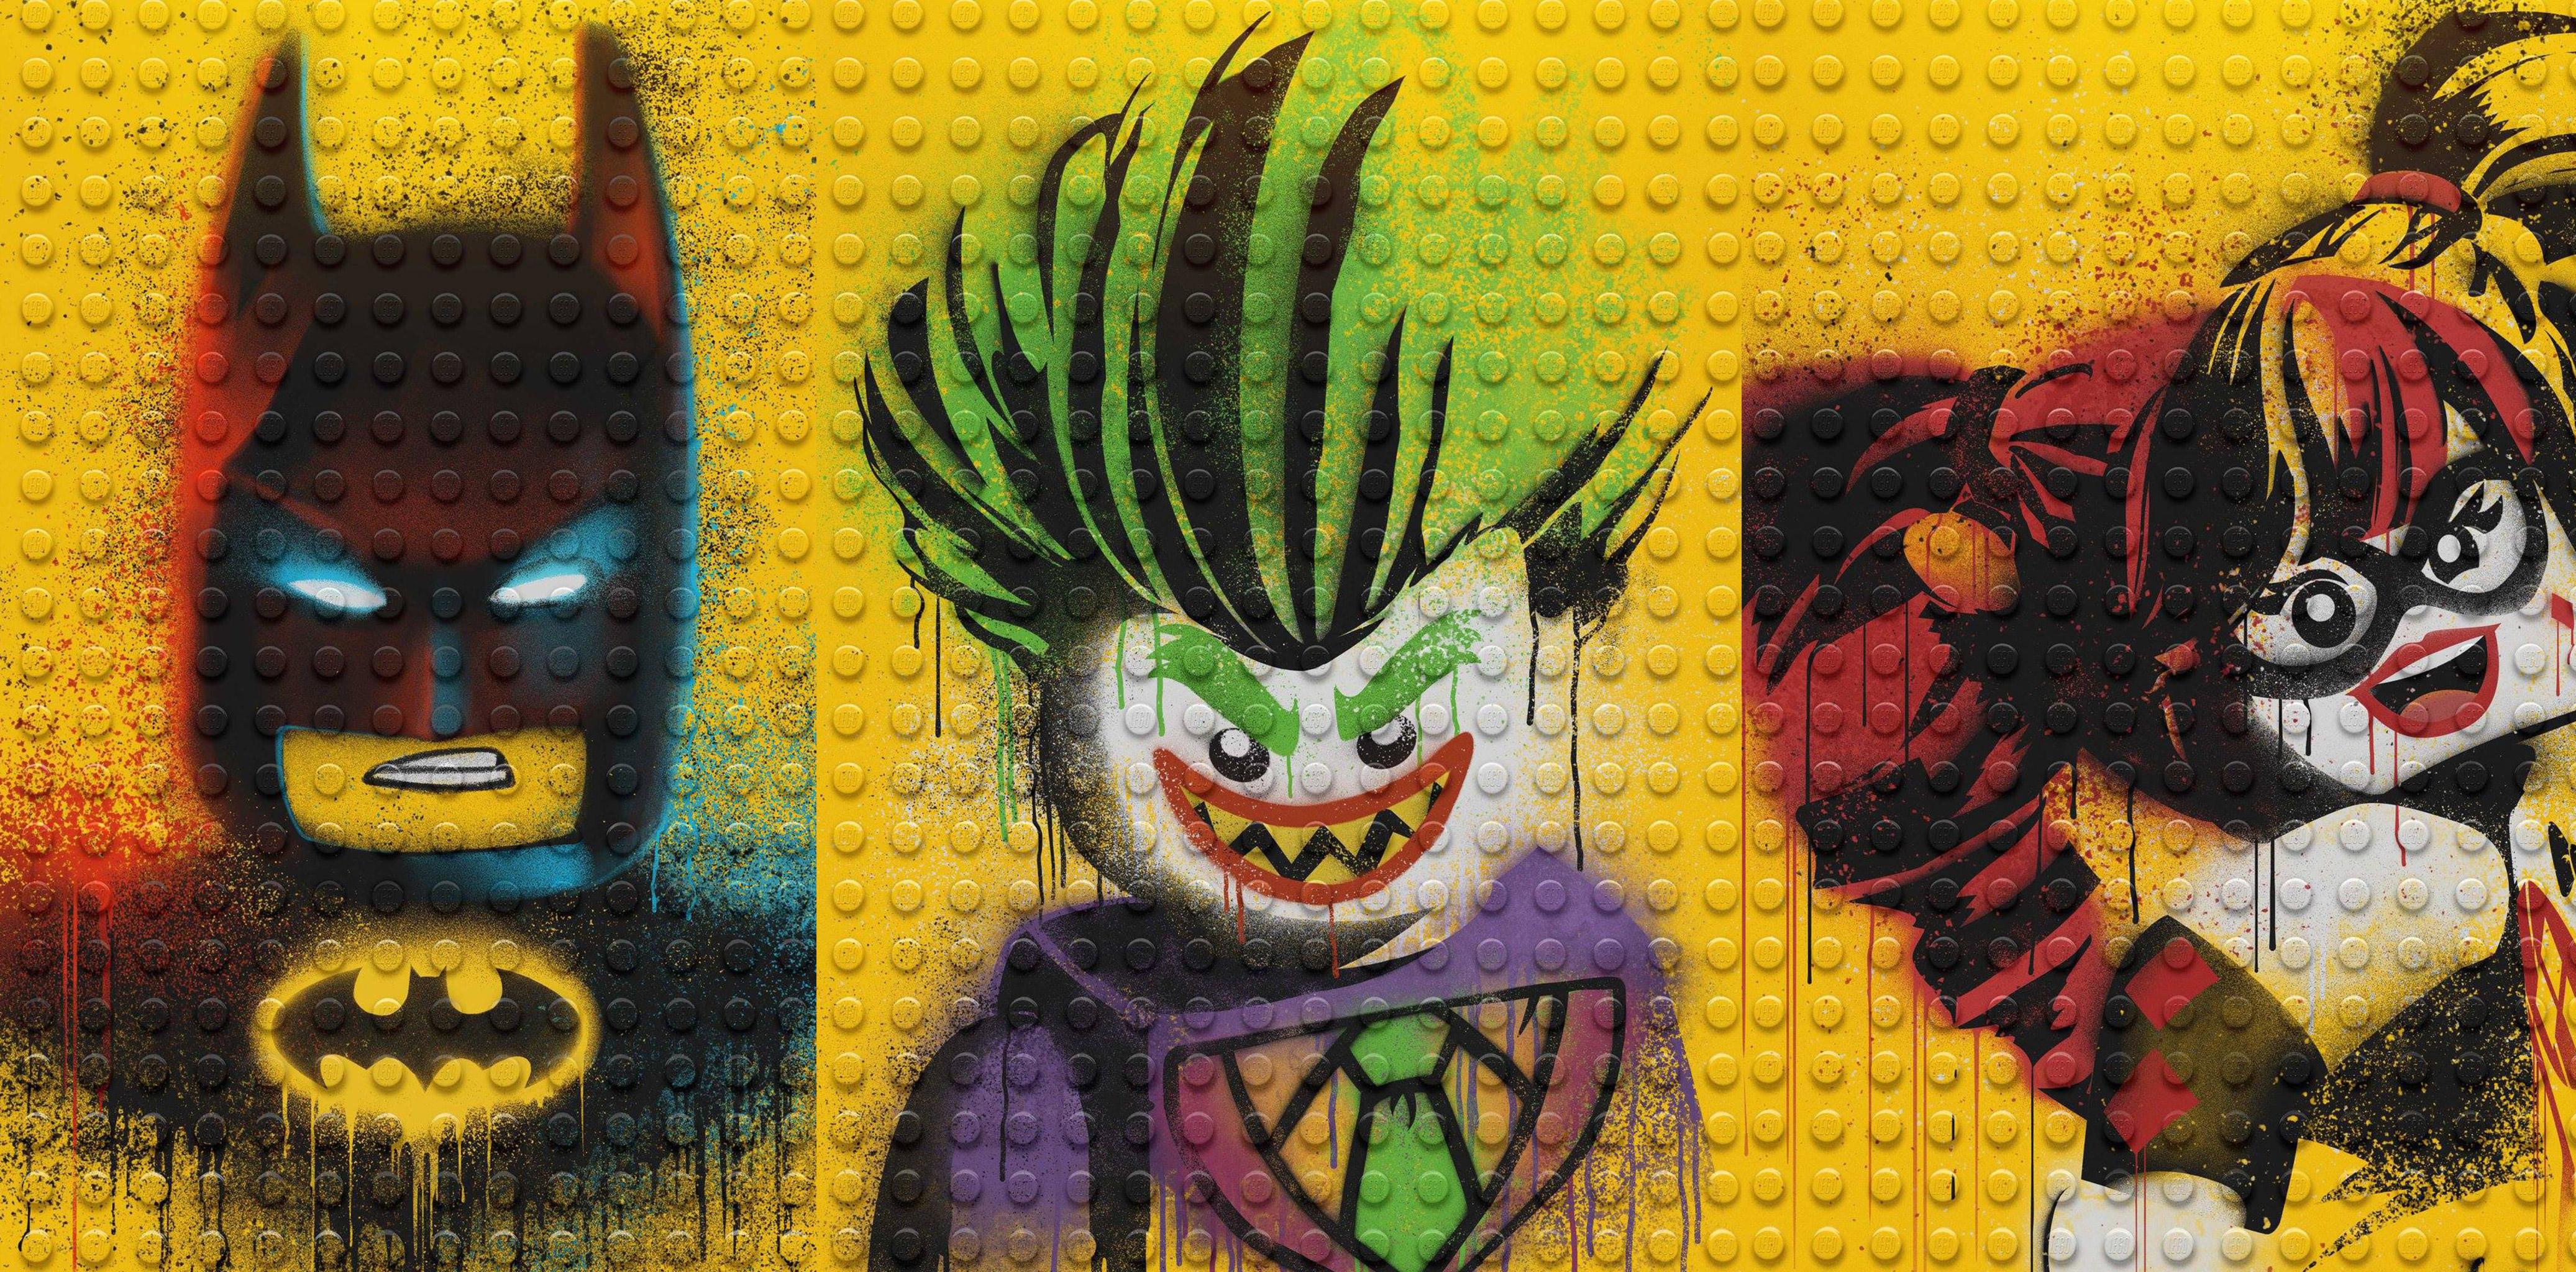 The Lego Batman Harley Quinn And Joker Lego Batman Movie